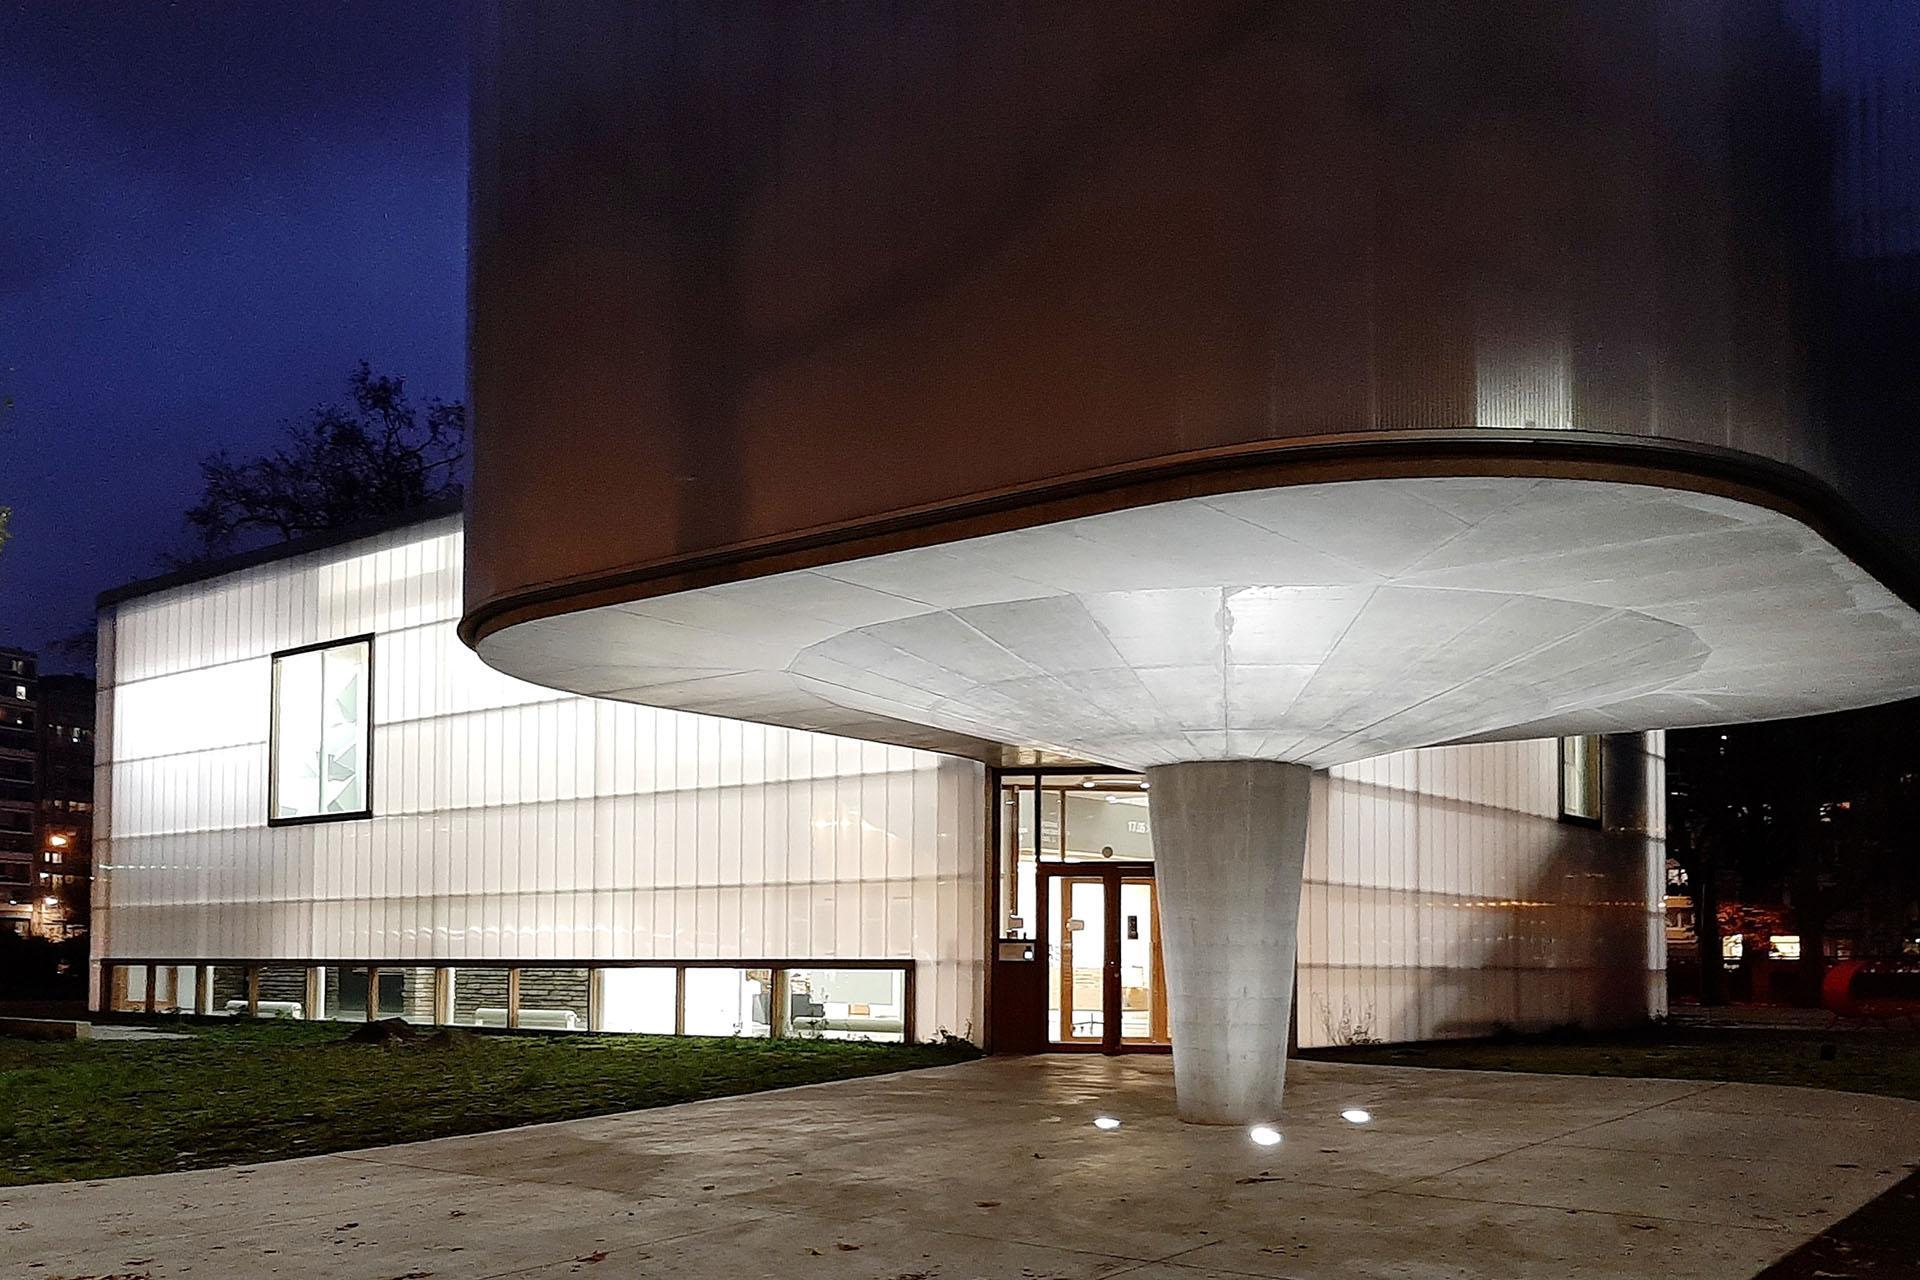 Trinkhall museum - Liège - vue extérieure 3